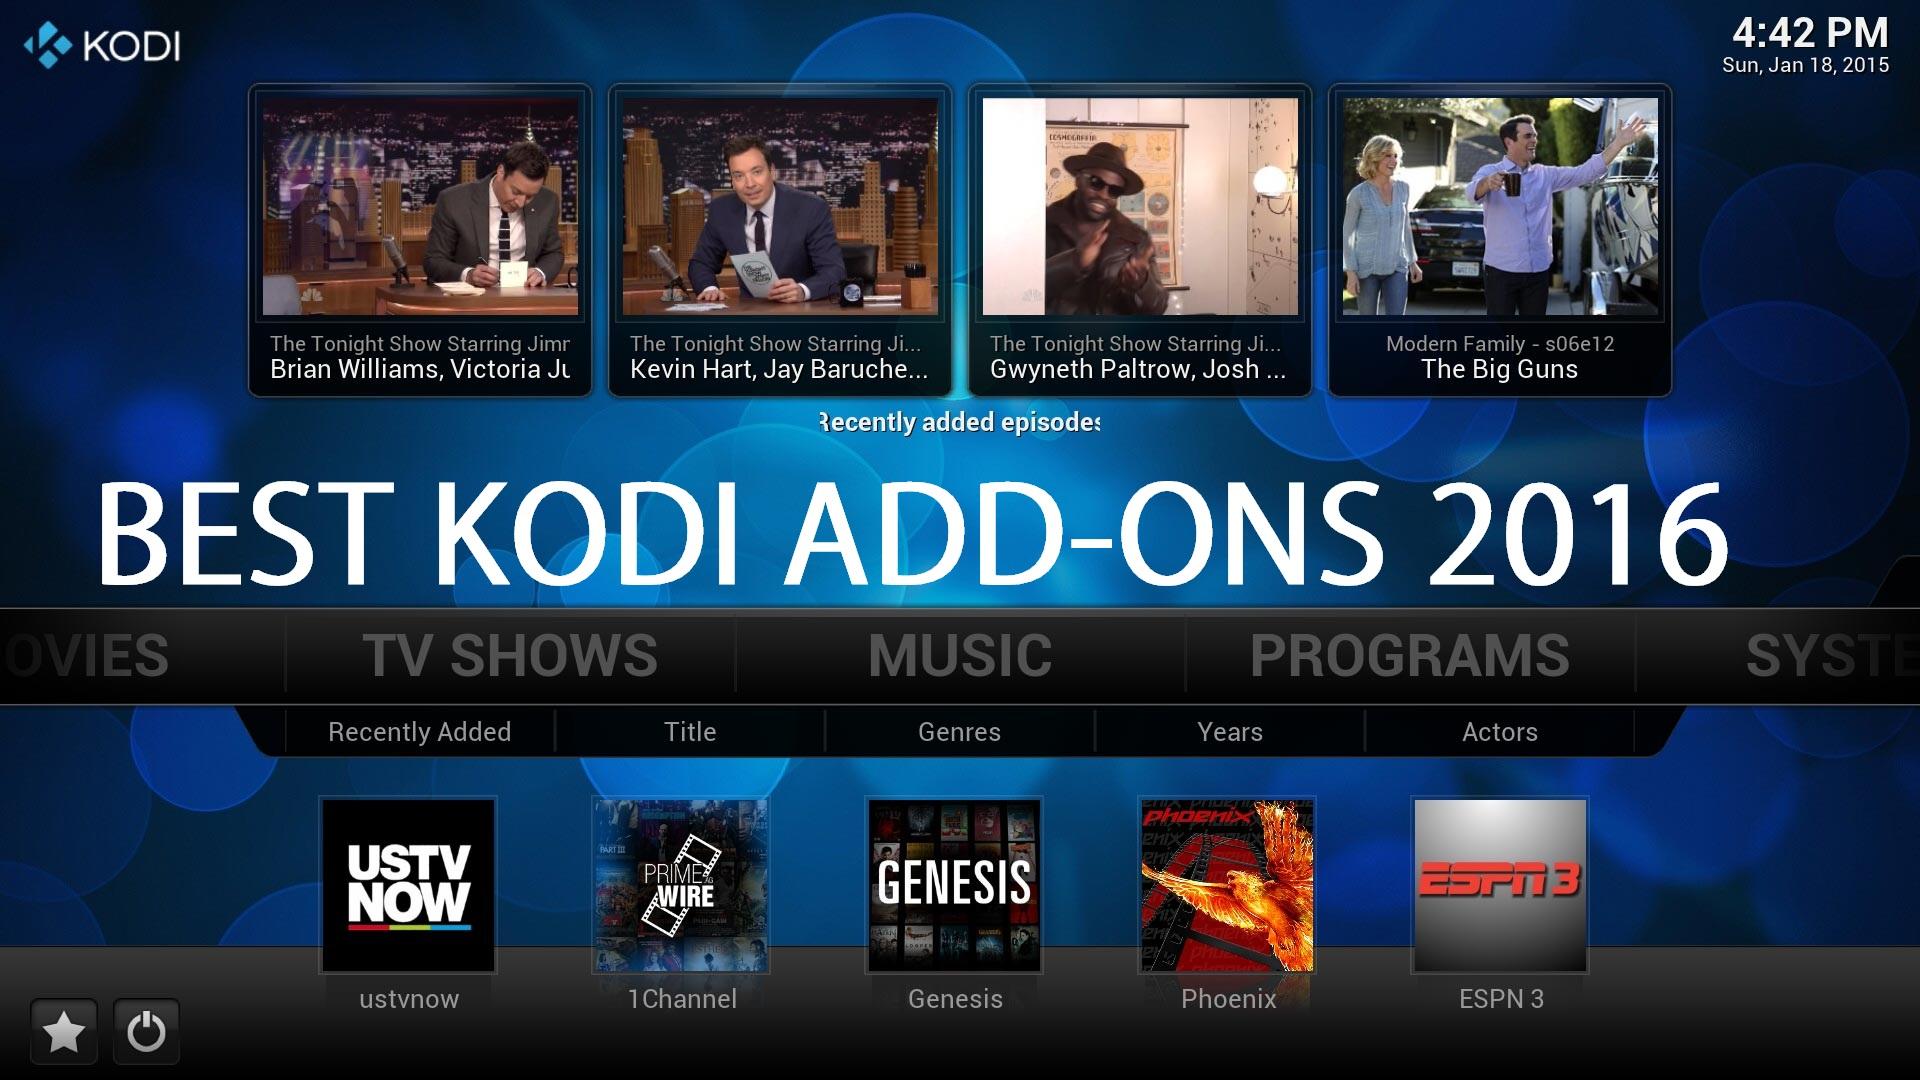 Top Kodi Add-ons - watch free movies - Dr.Geeky